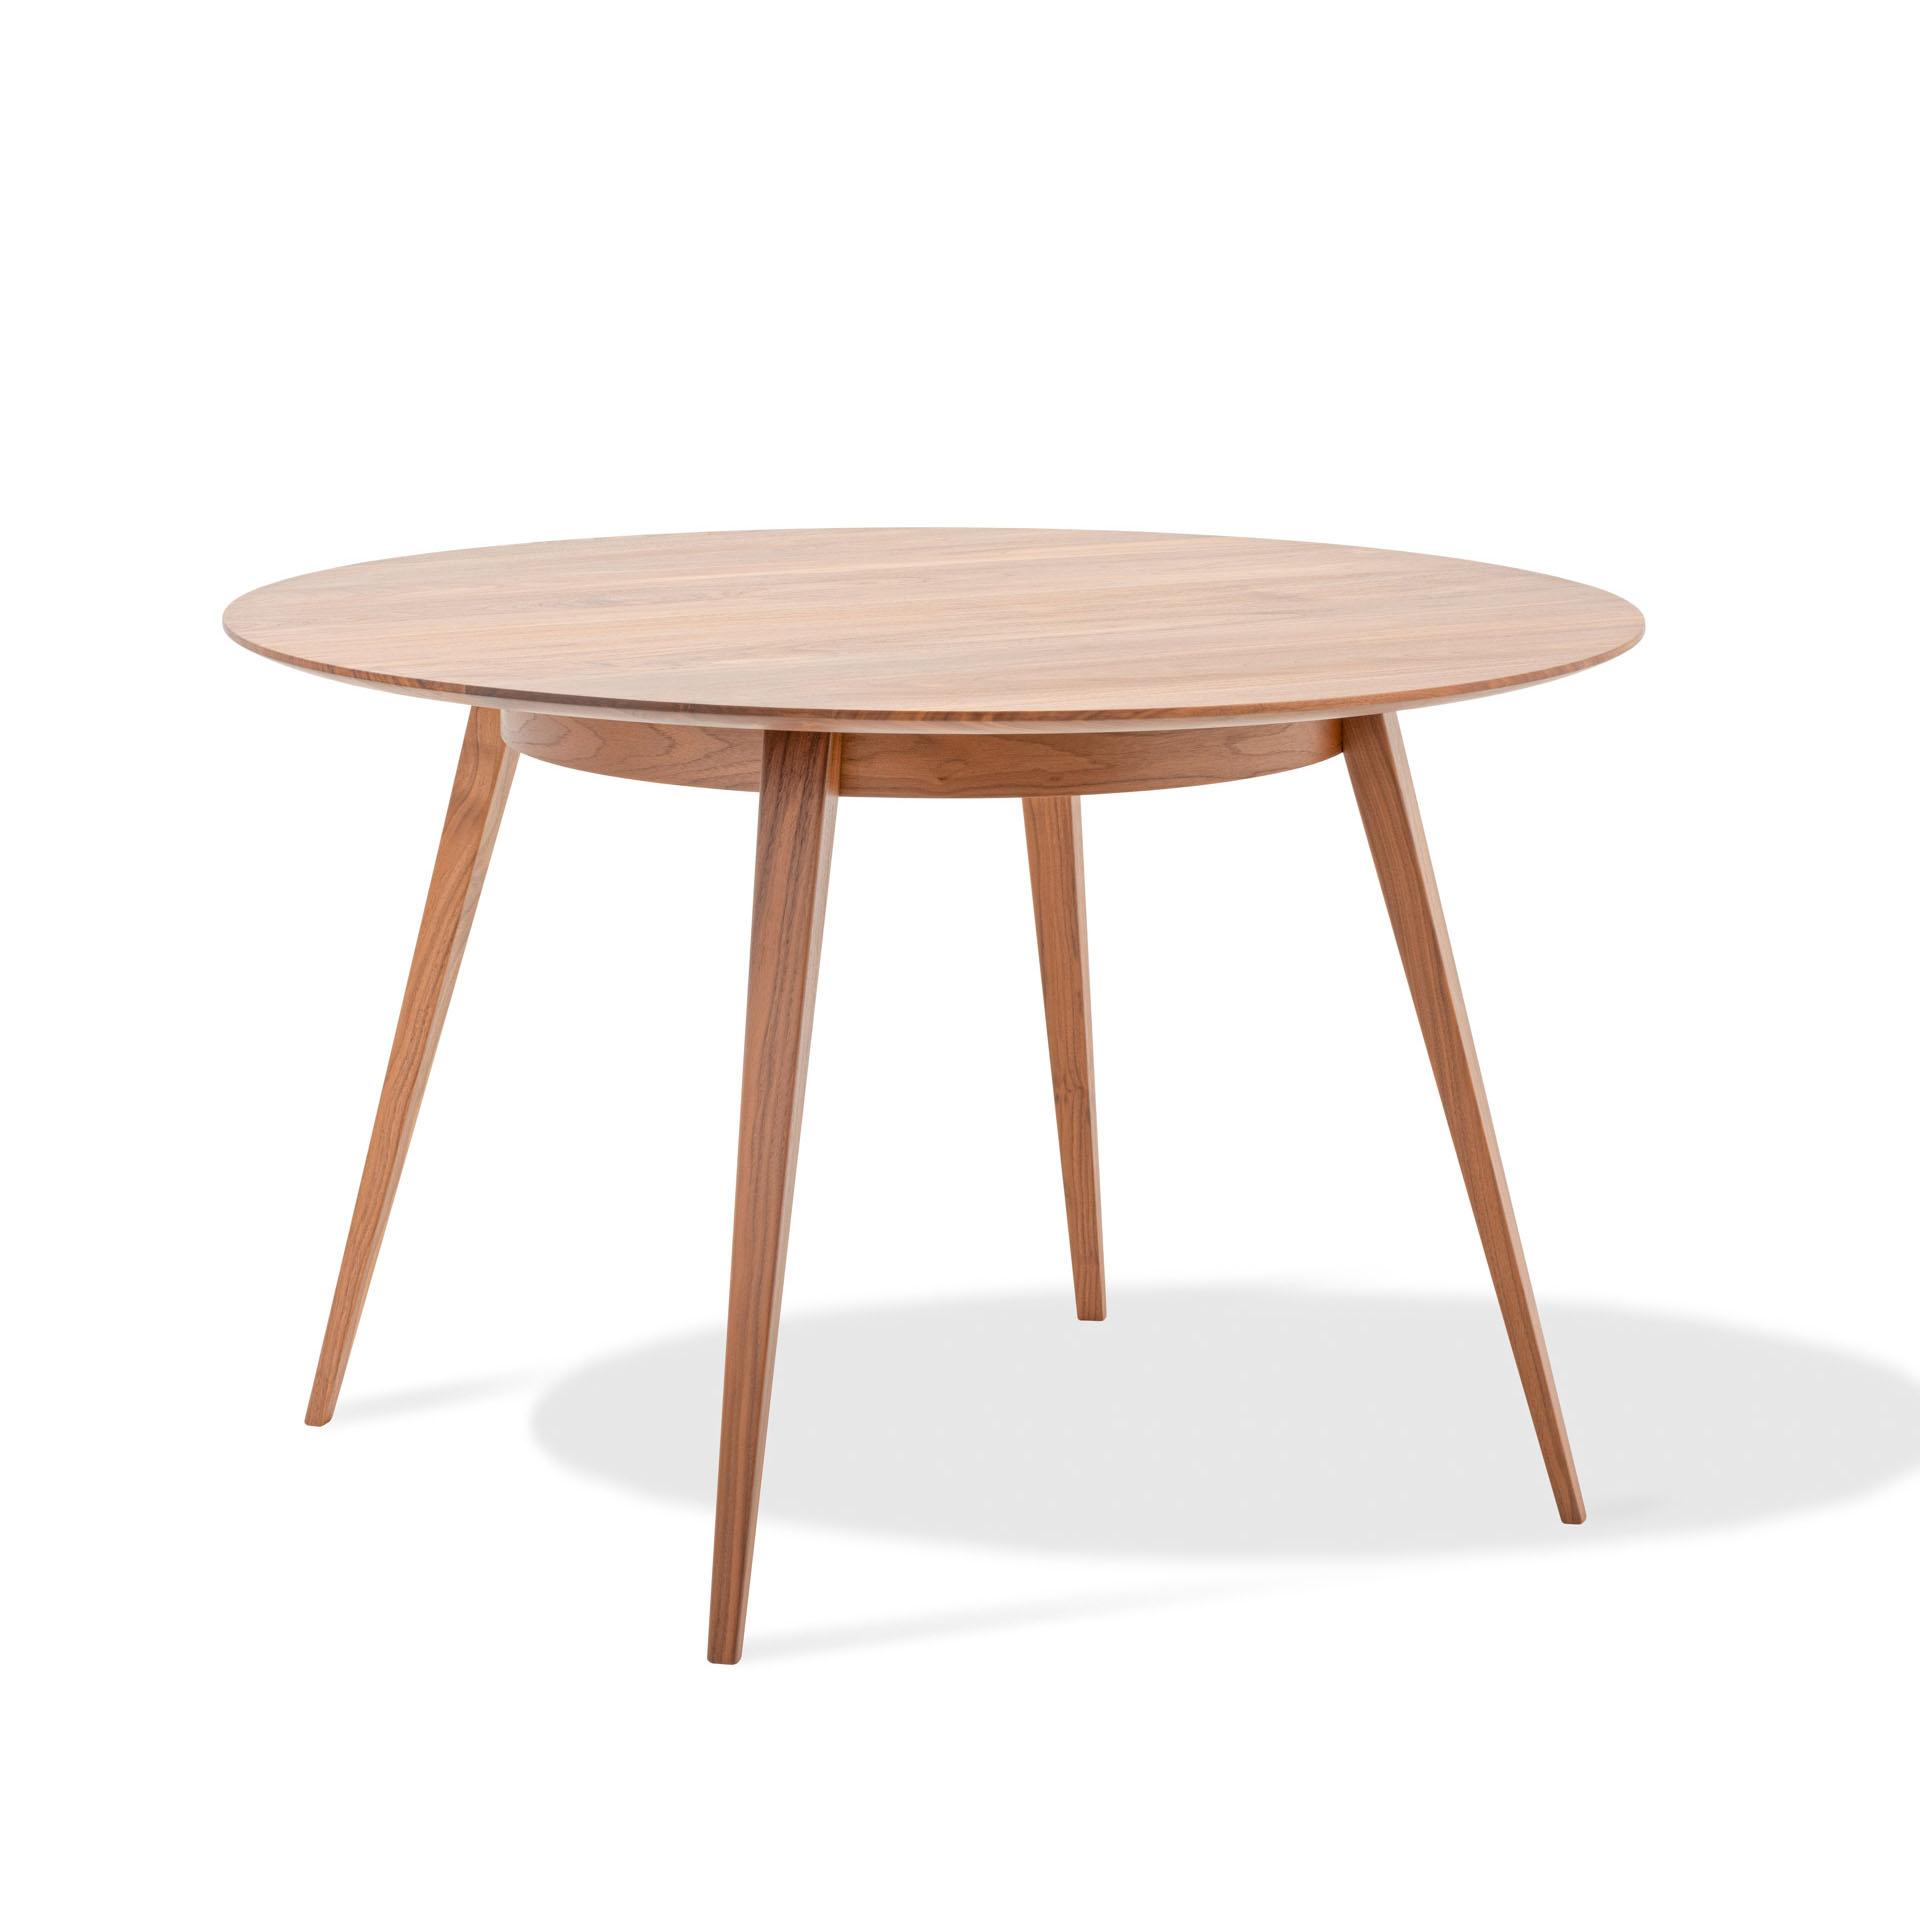 Stół okrągły Dunn